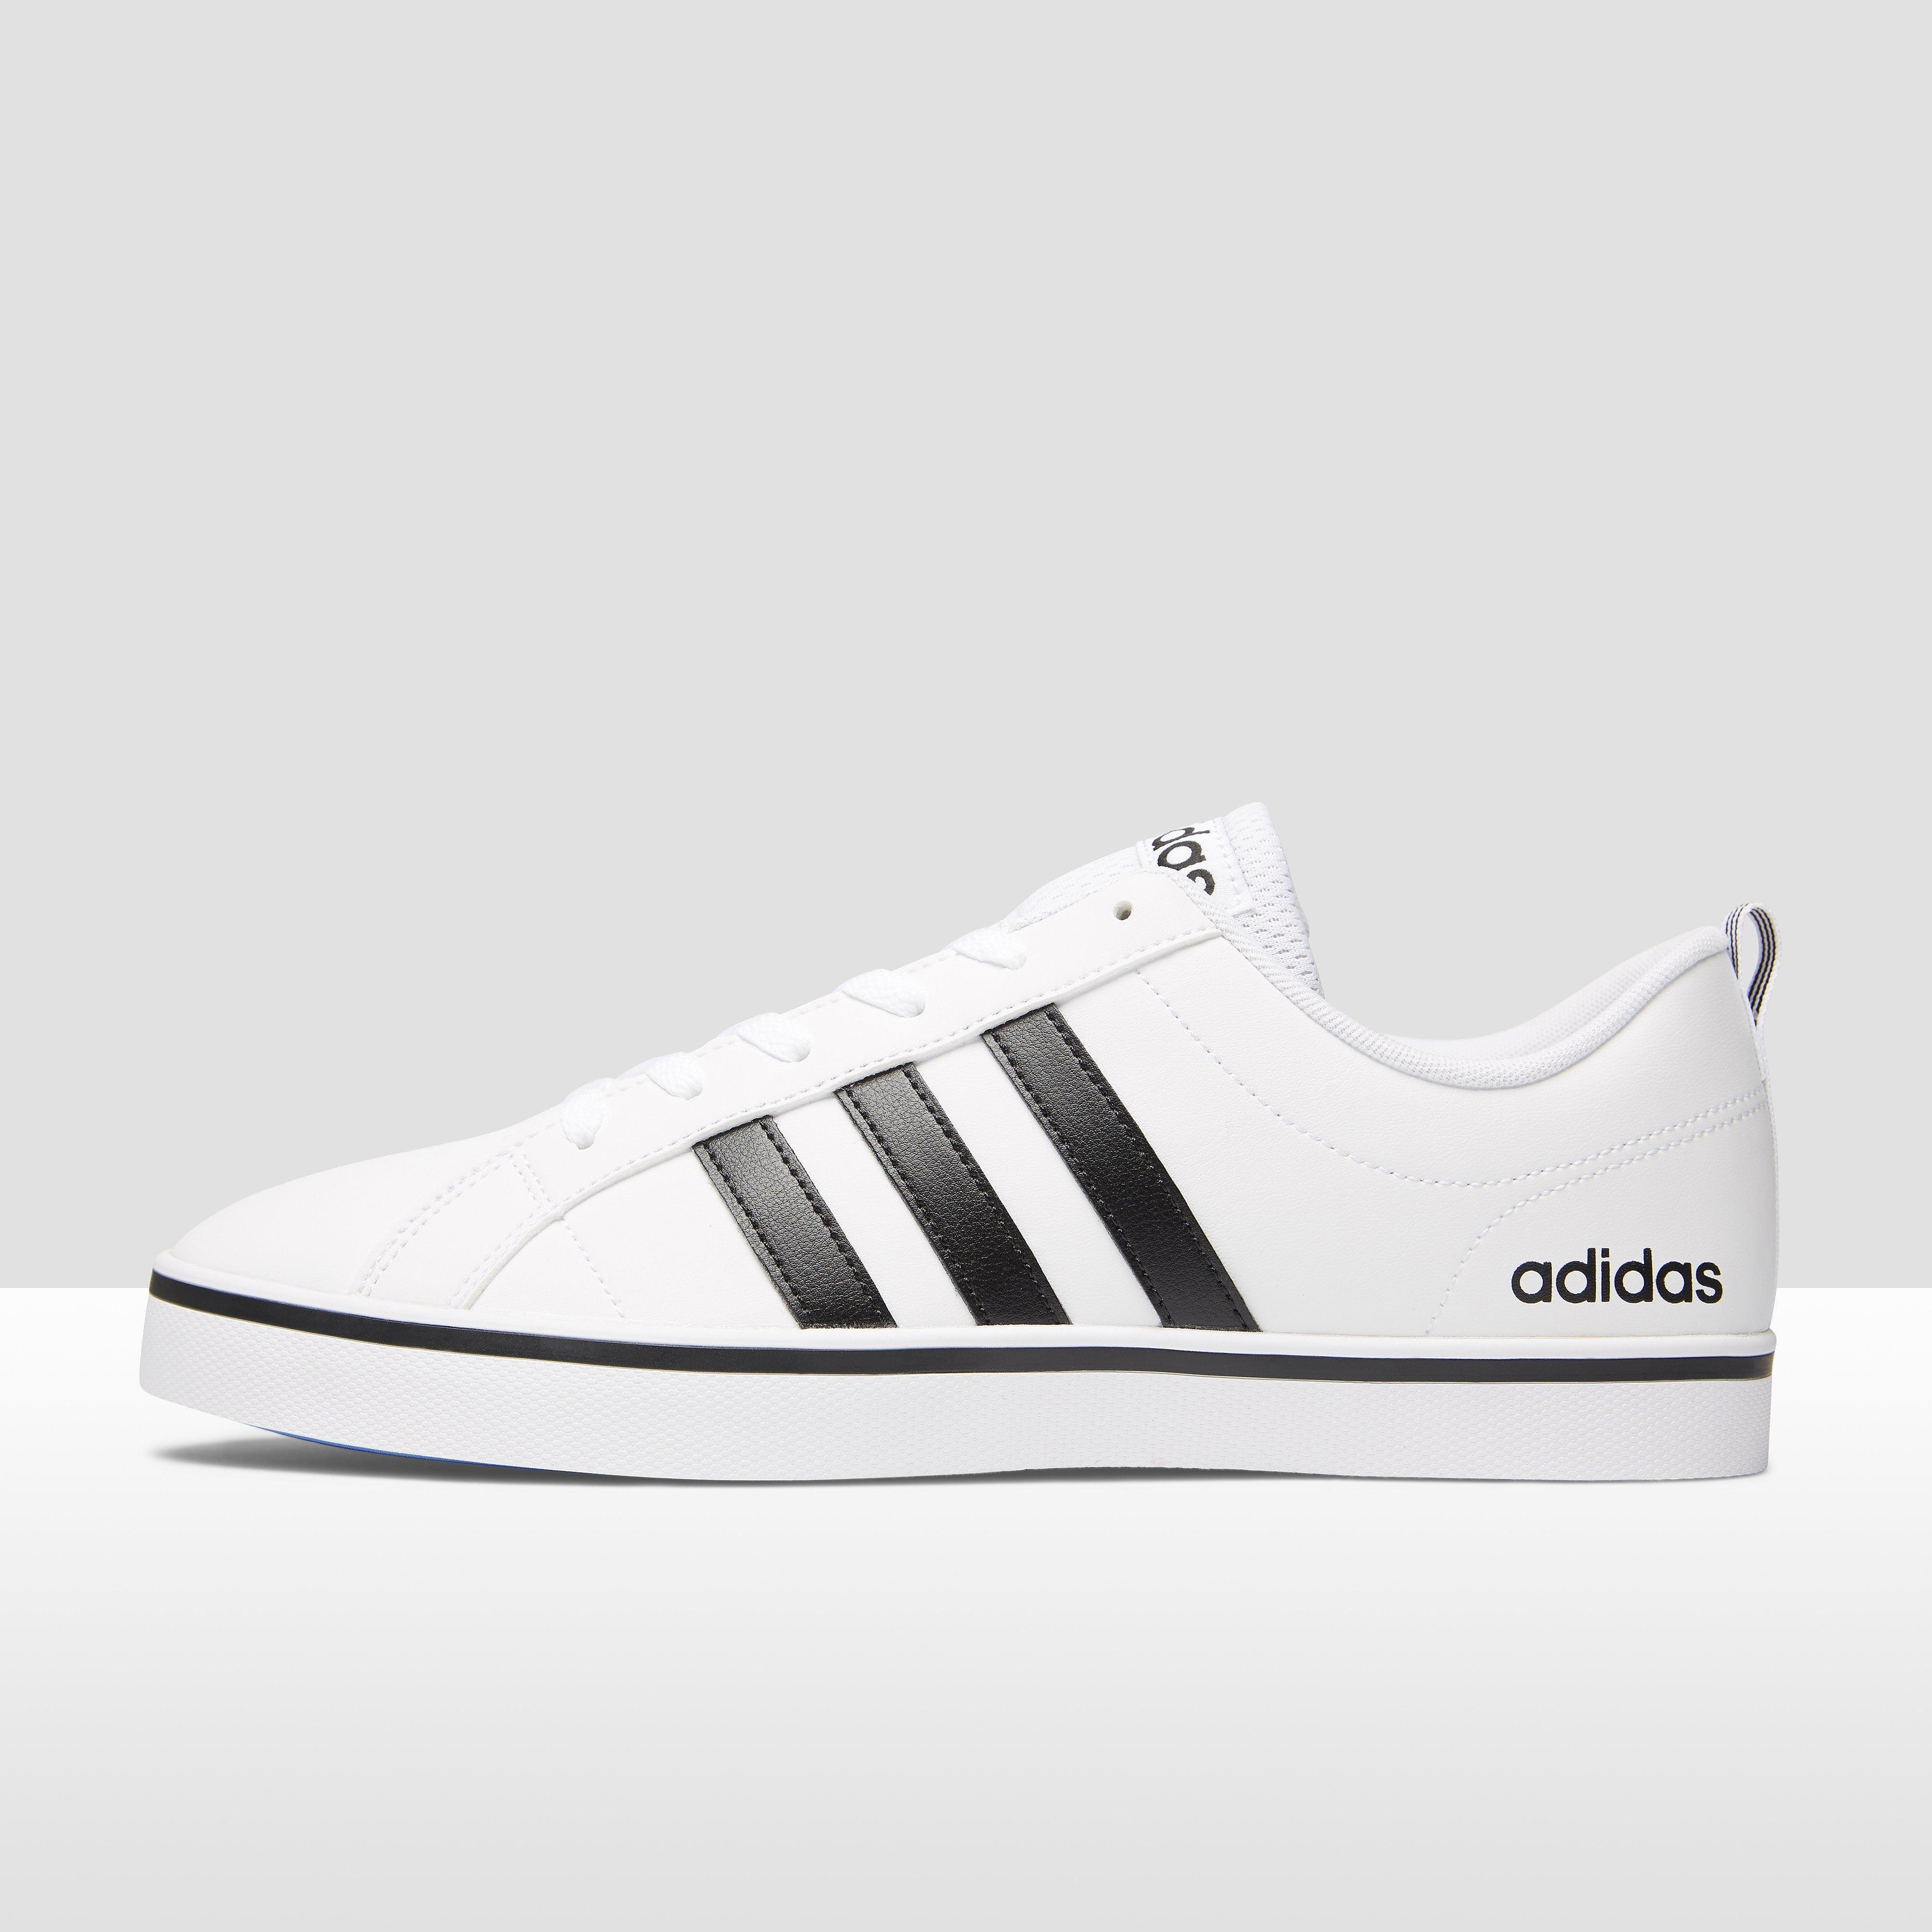 Adidas Pace AW4594 Wit Zwart-44 maat 44